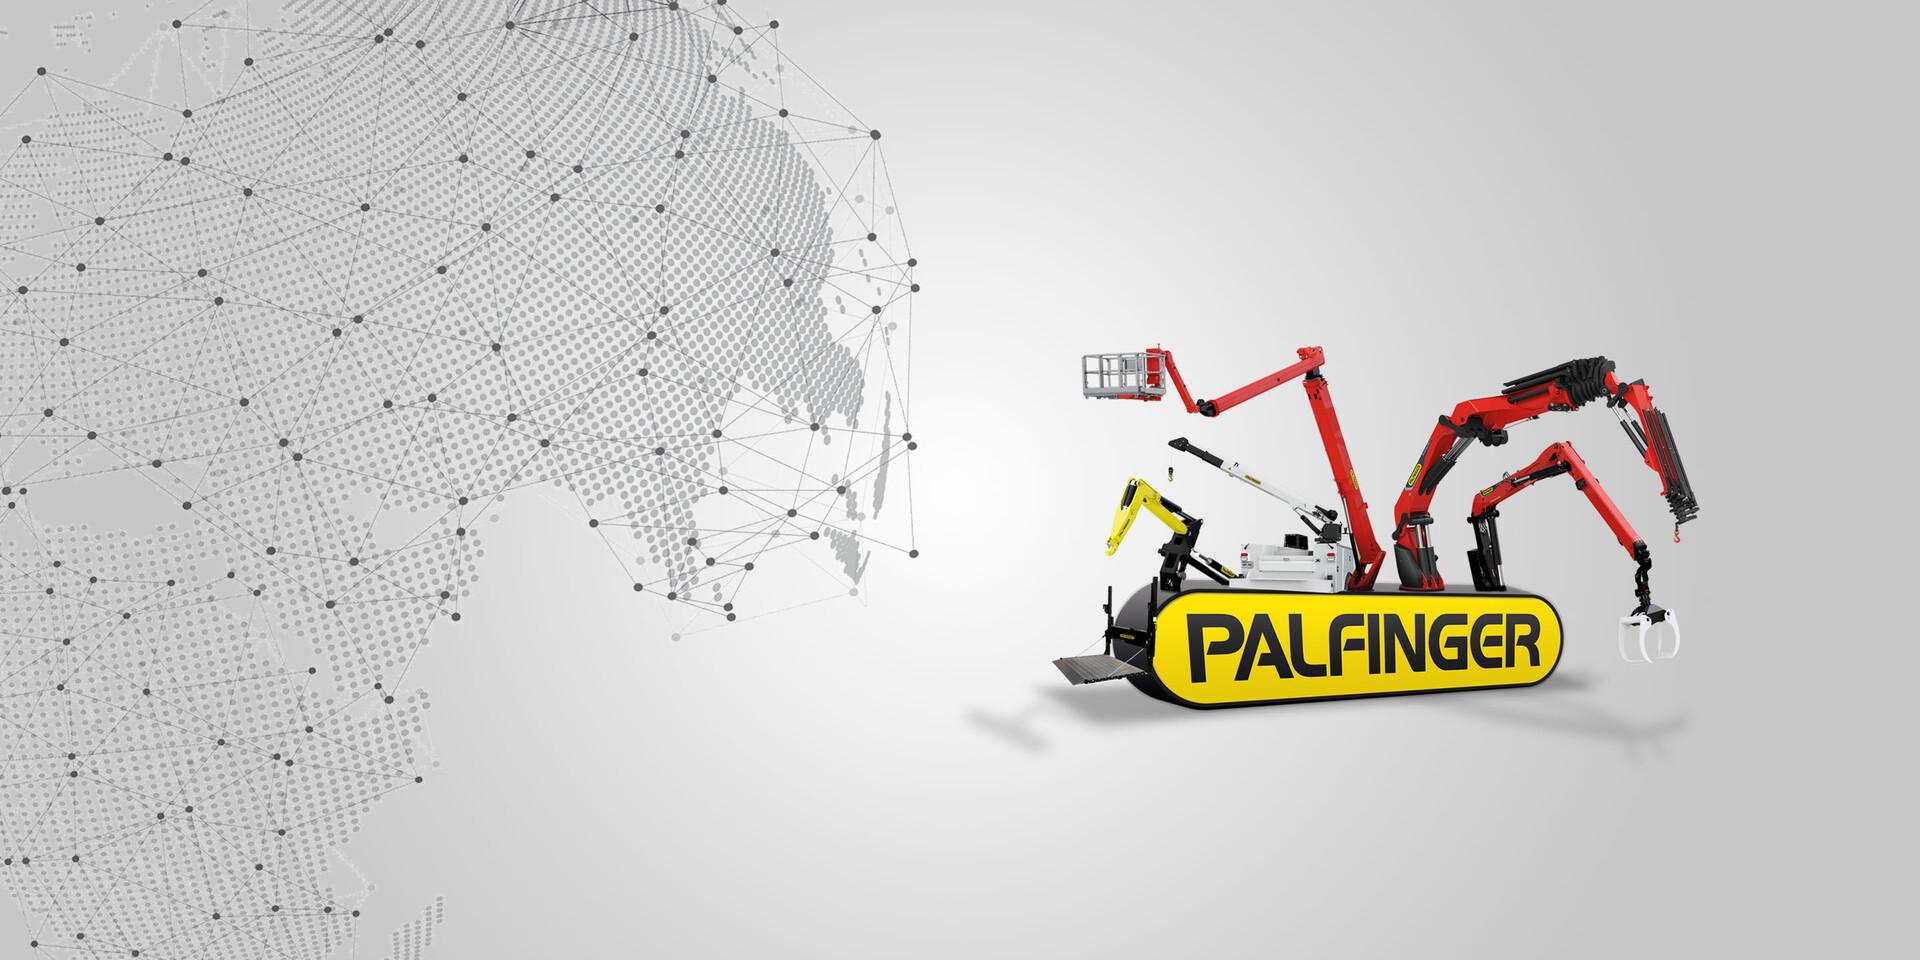 PALFINGER - One Partner All Solutions